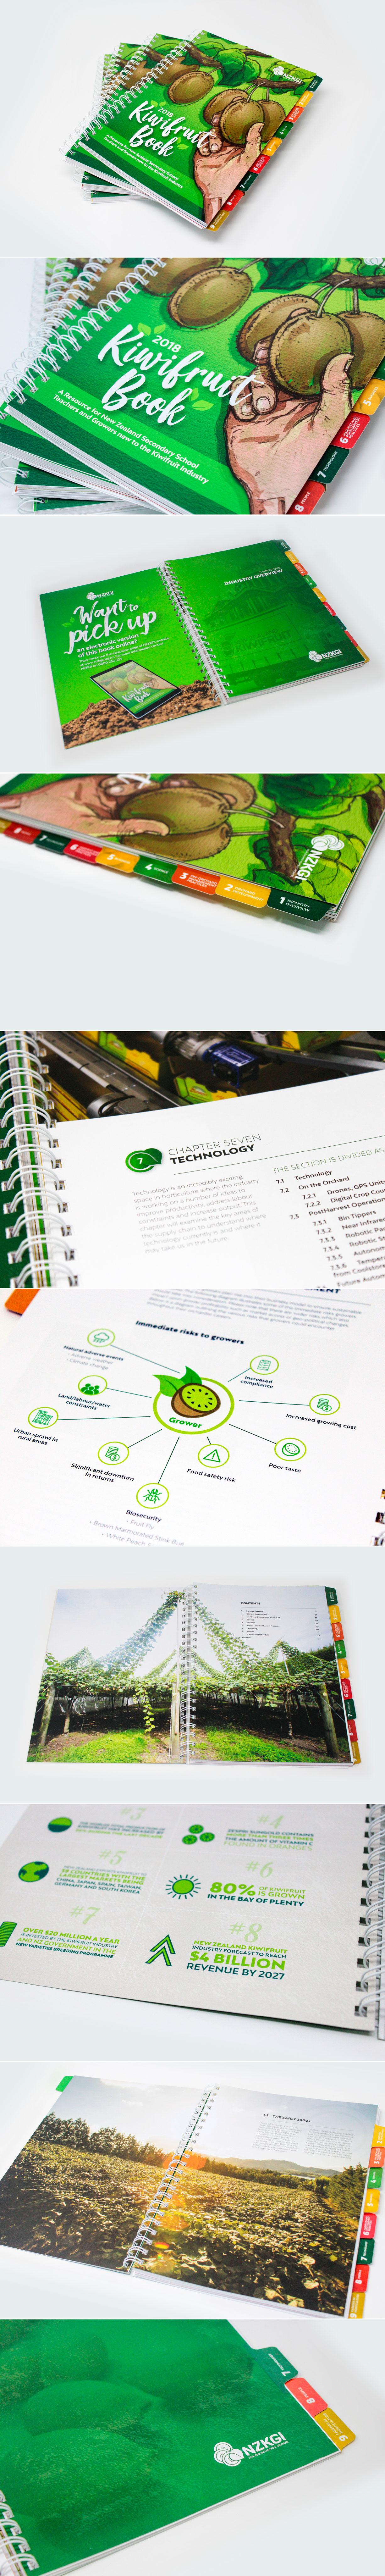 NZKGI_Kiwifruit_Booklet_Inkdrop.jpg